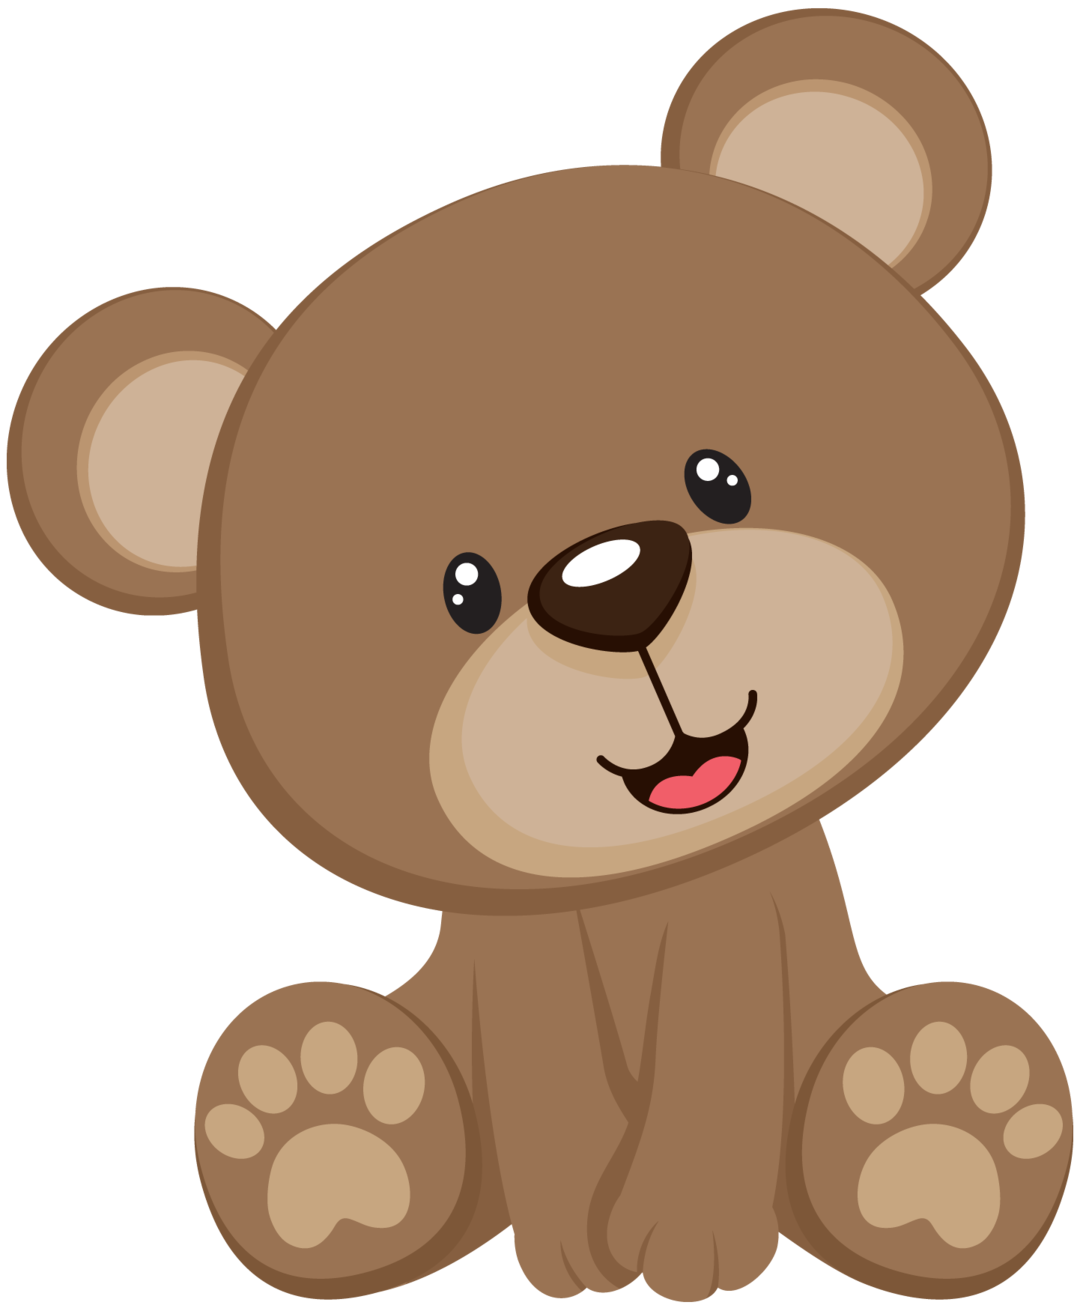 1080x1311 Tubes Ursinhos Baby Shower Babies, Bears And Teddy